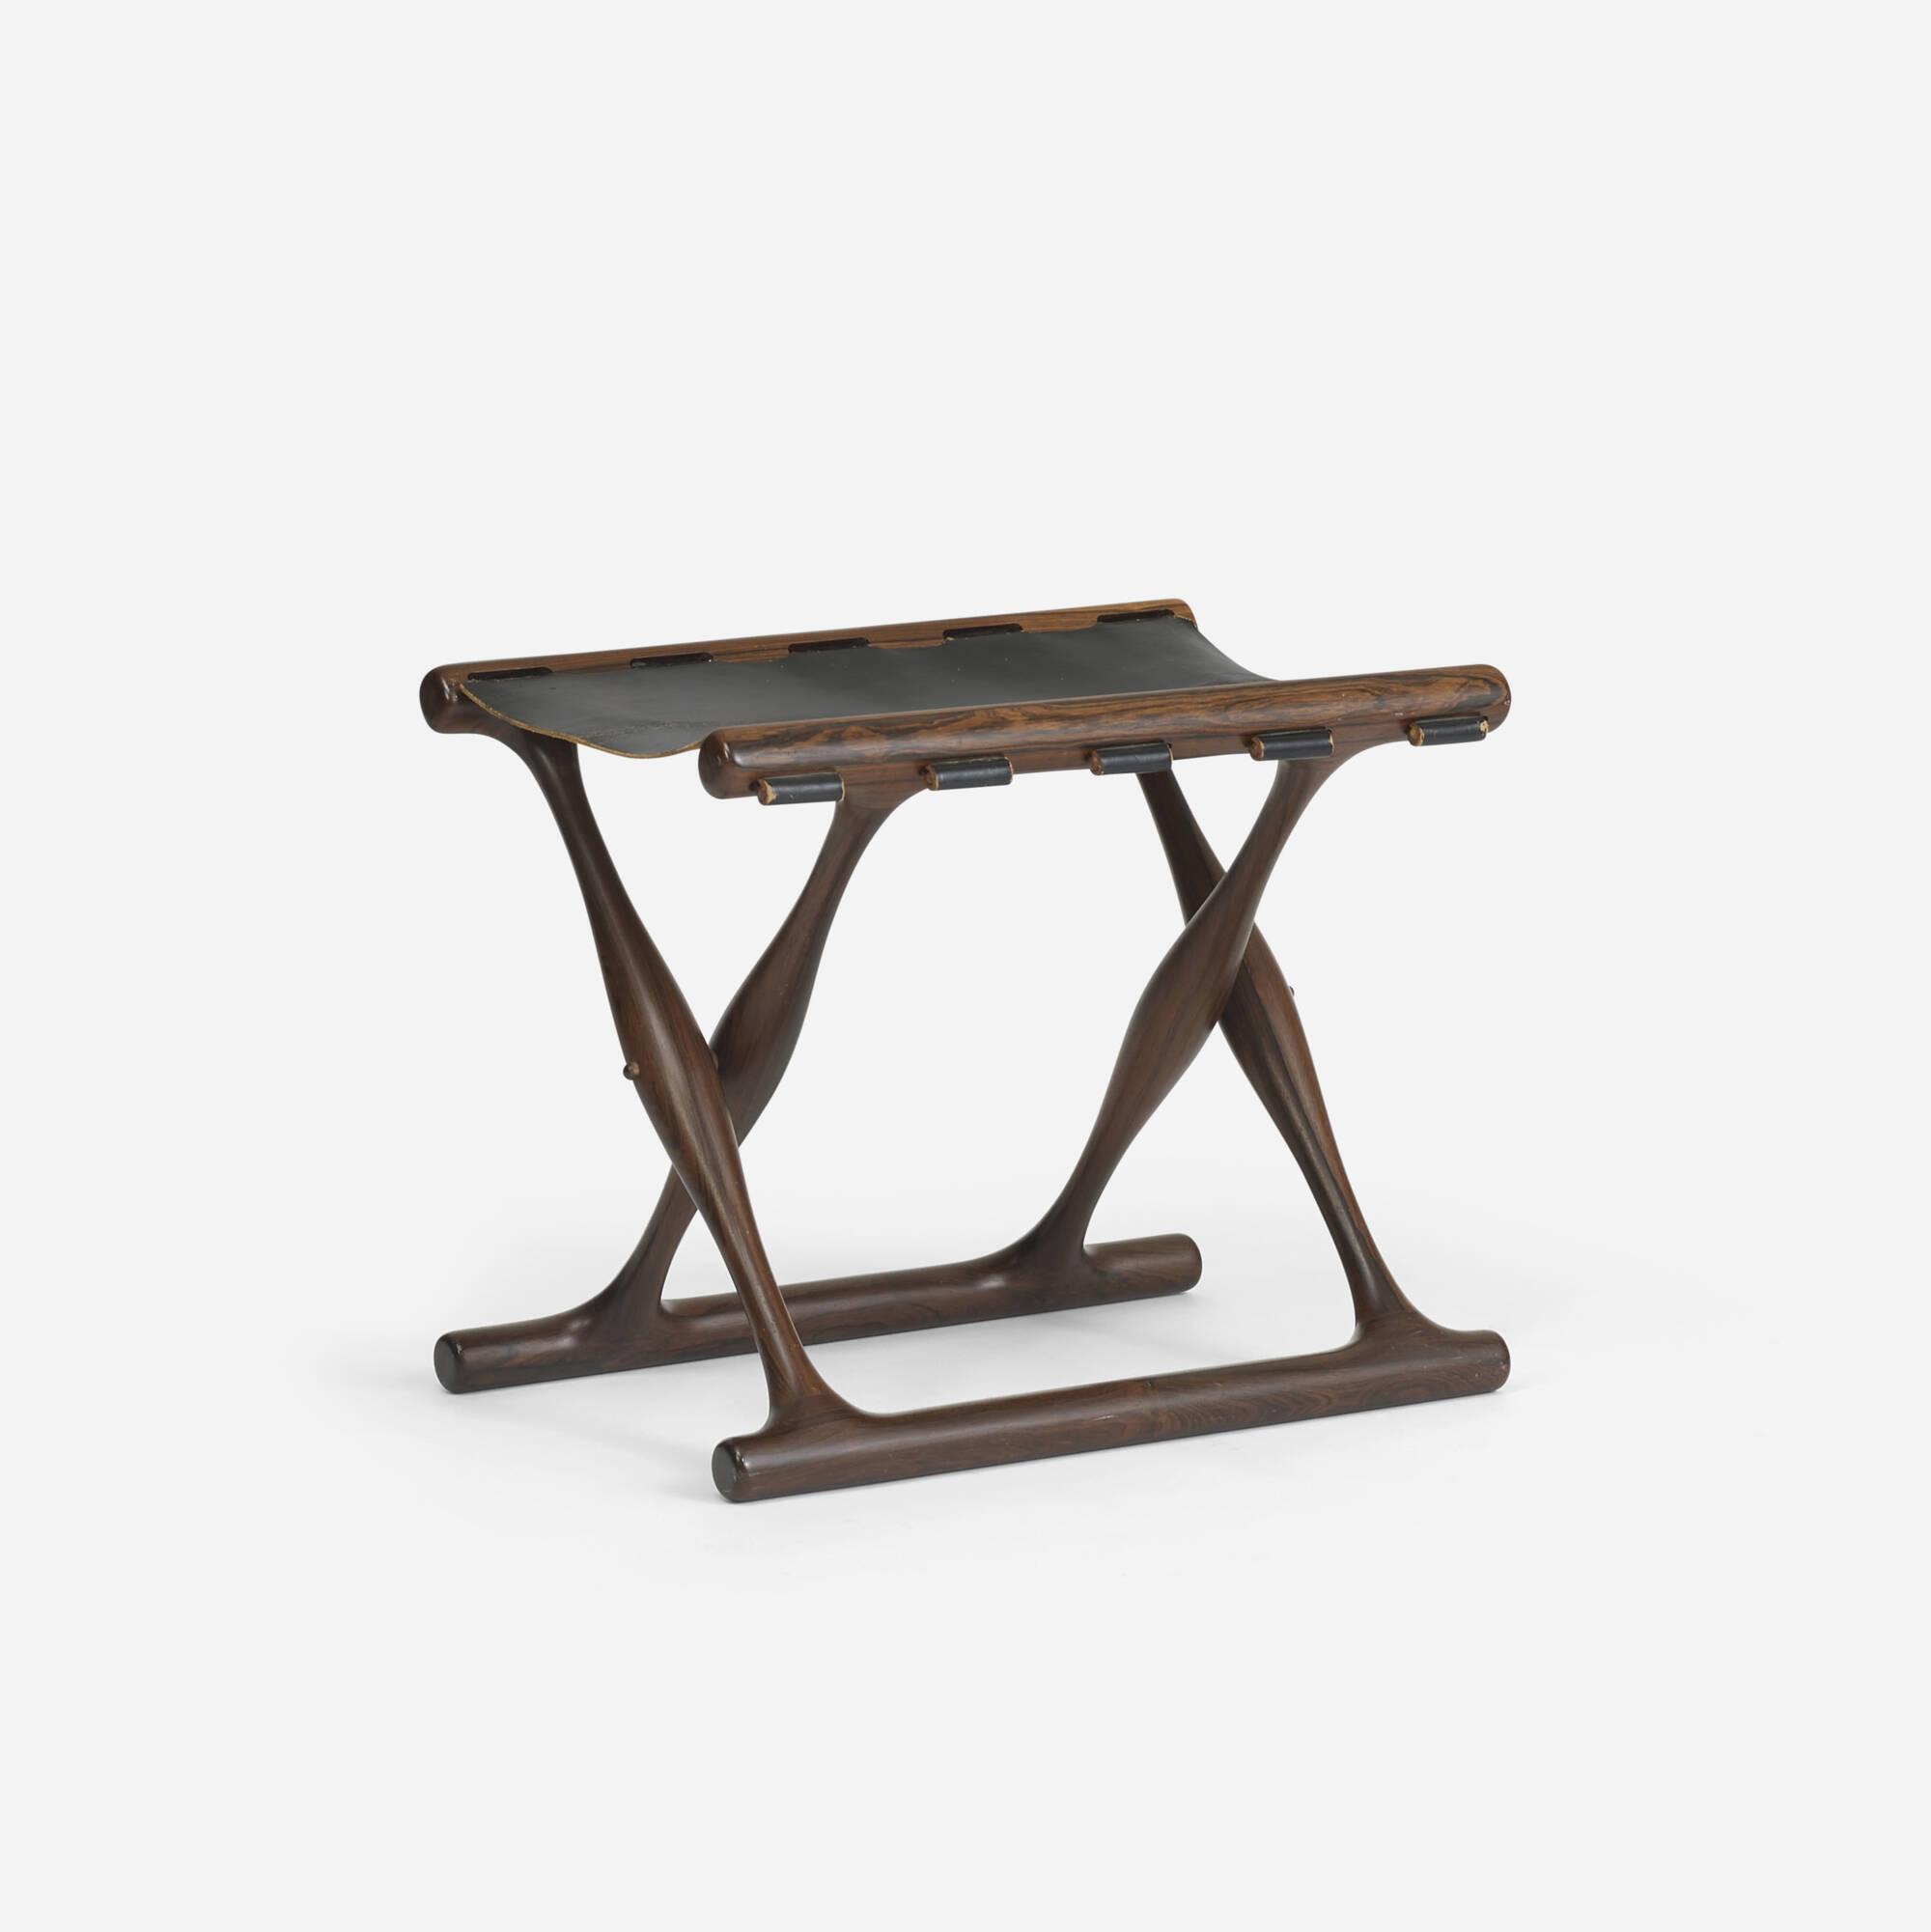 301: Poul Hundevad / Guldhoj folding stool (1 of 2)